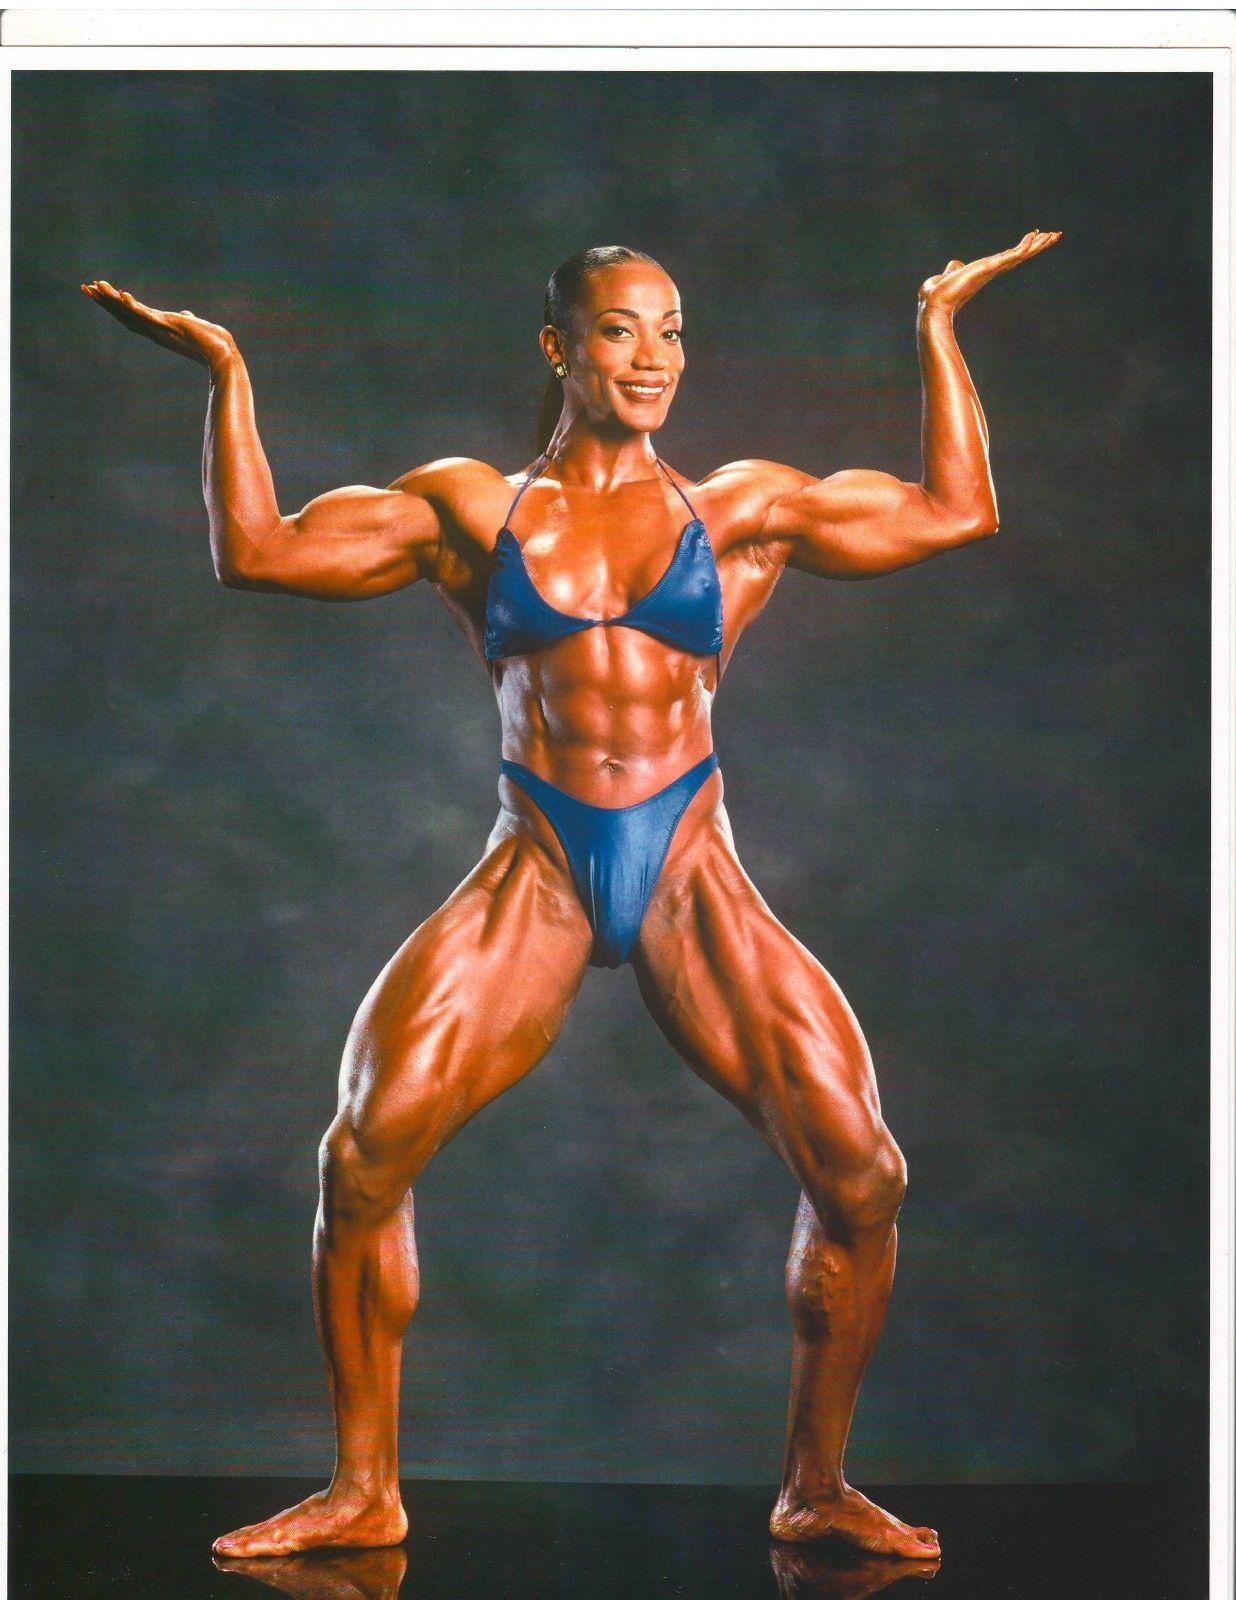 Angela Salvagno Twitter female bodybuilder – femalemuscle, female bodybuilding and